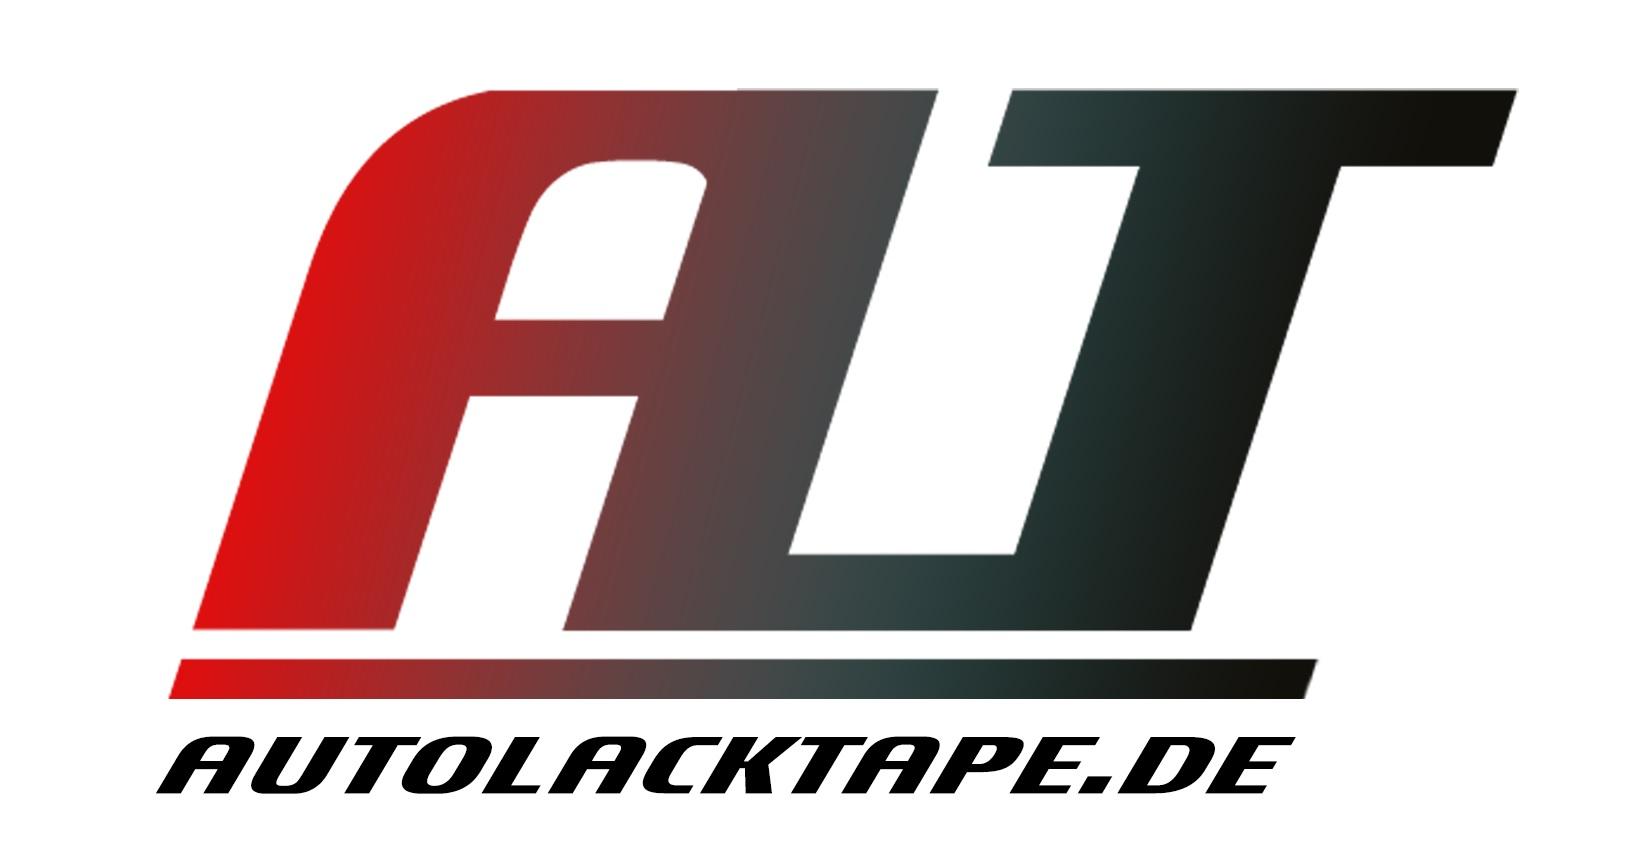 Autolacktape-Logo